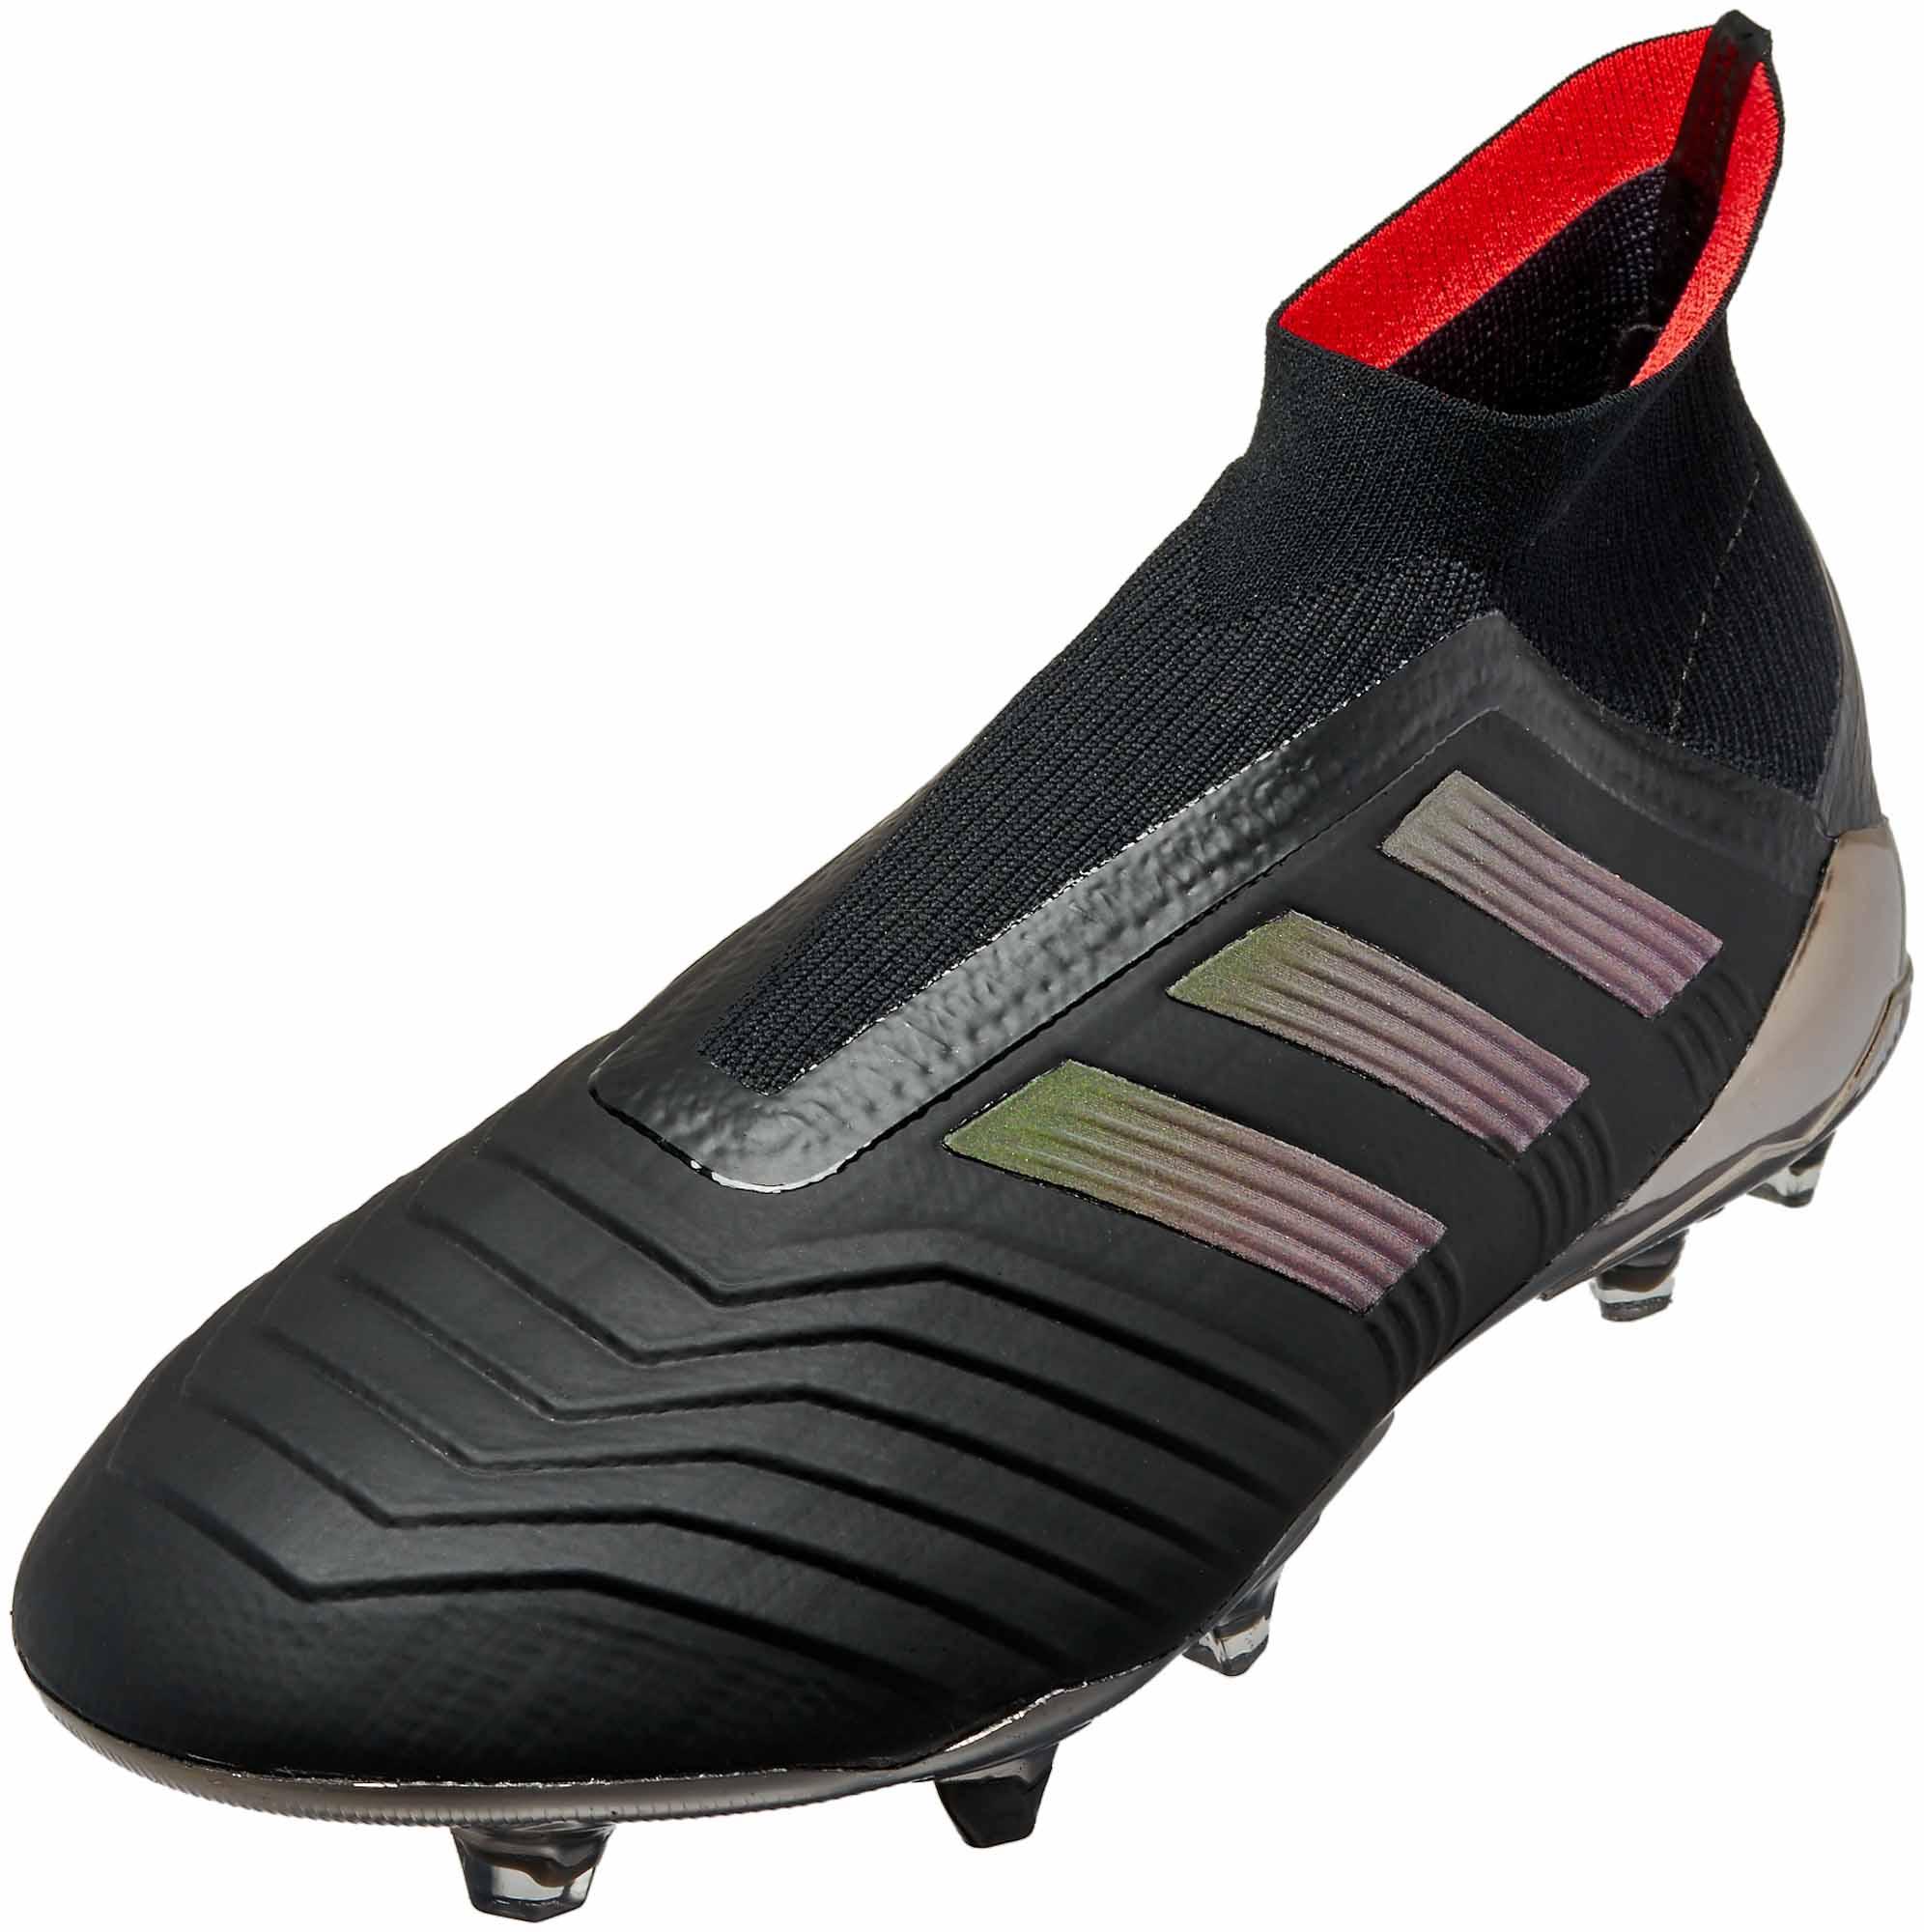 dd3940dec480 adidas Predator 18+ FG - Black   Real Coral - Soccer Master